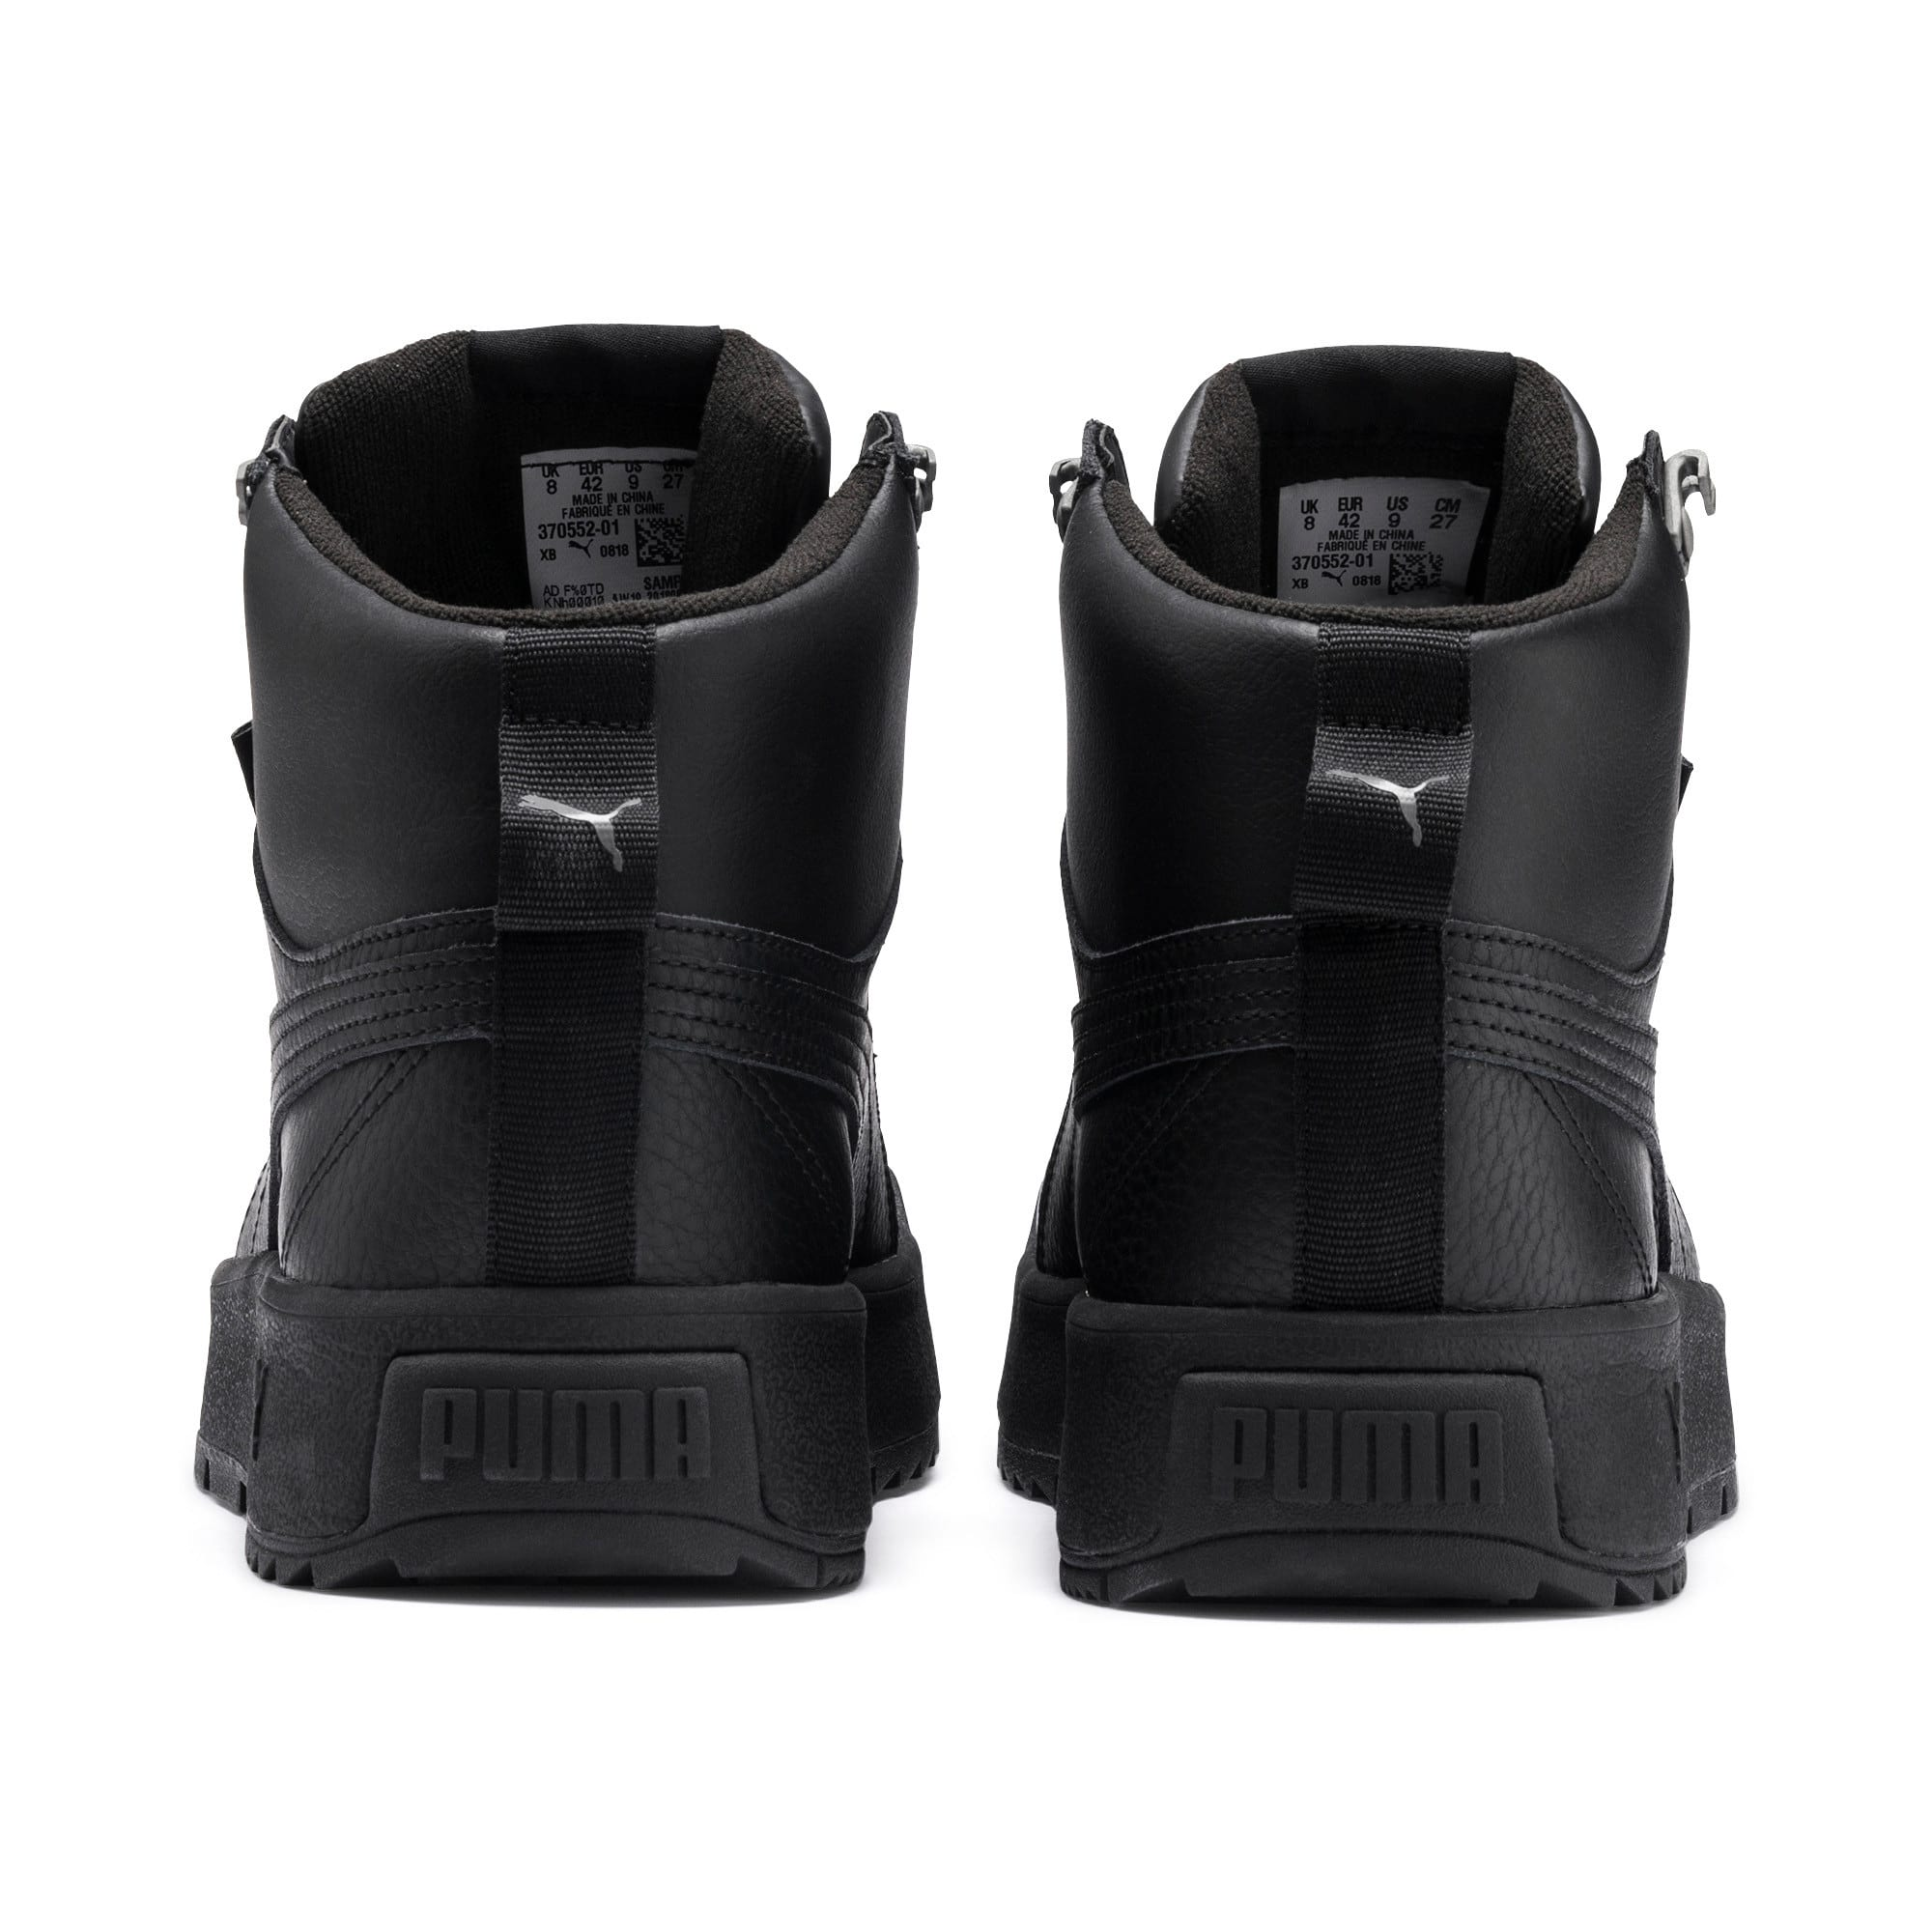 Thumbnail 4 of Tarrenz SB PURETEX Mid Sneakers, Puma Black-Puma Black, medium